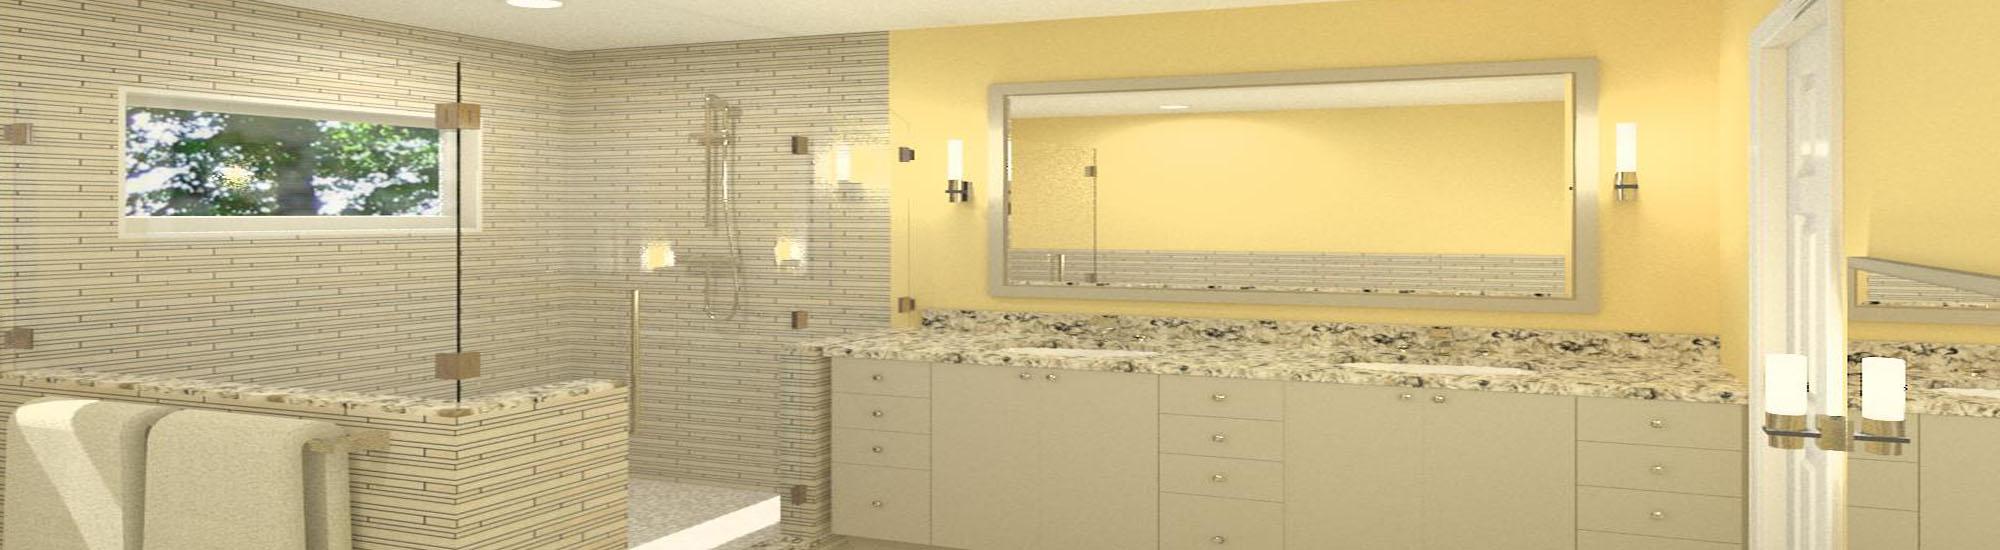 Bathroom CAD Design (1)-Design Build Pros